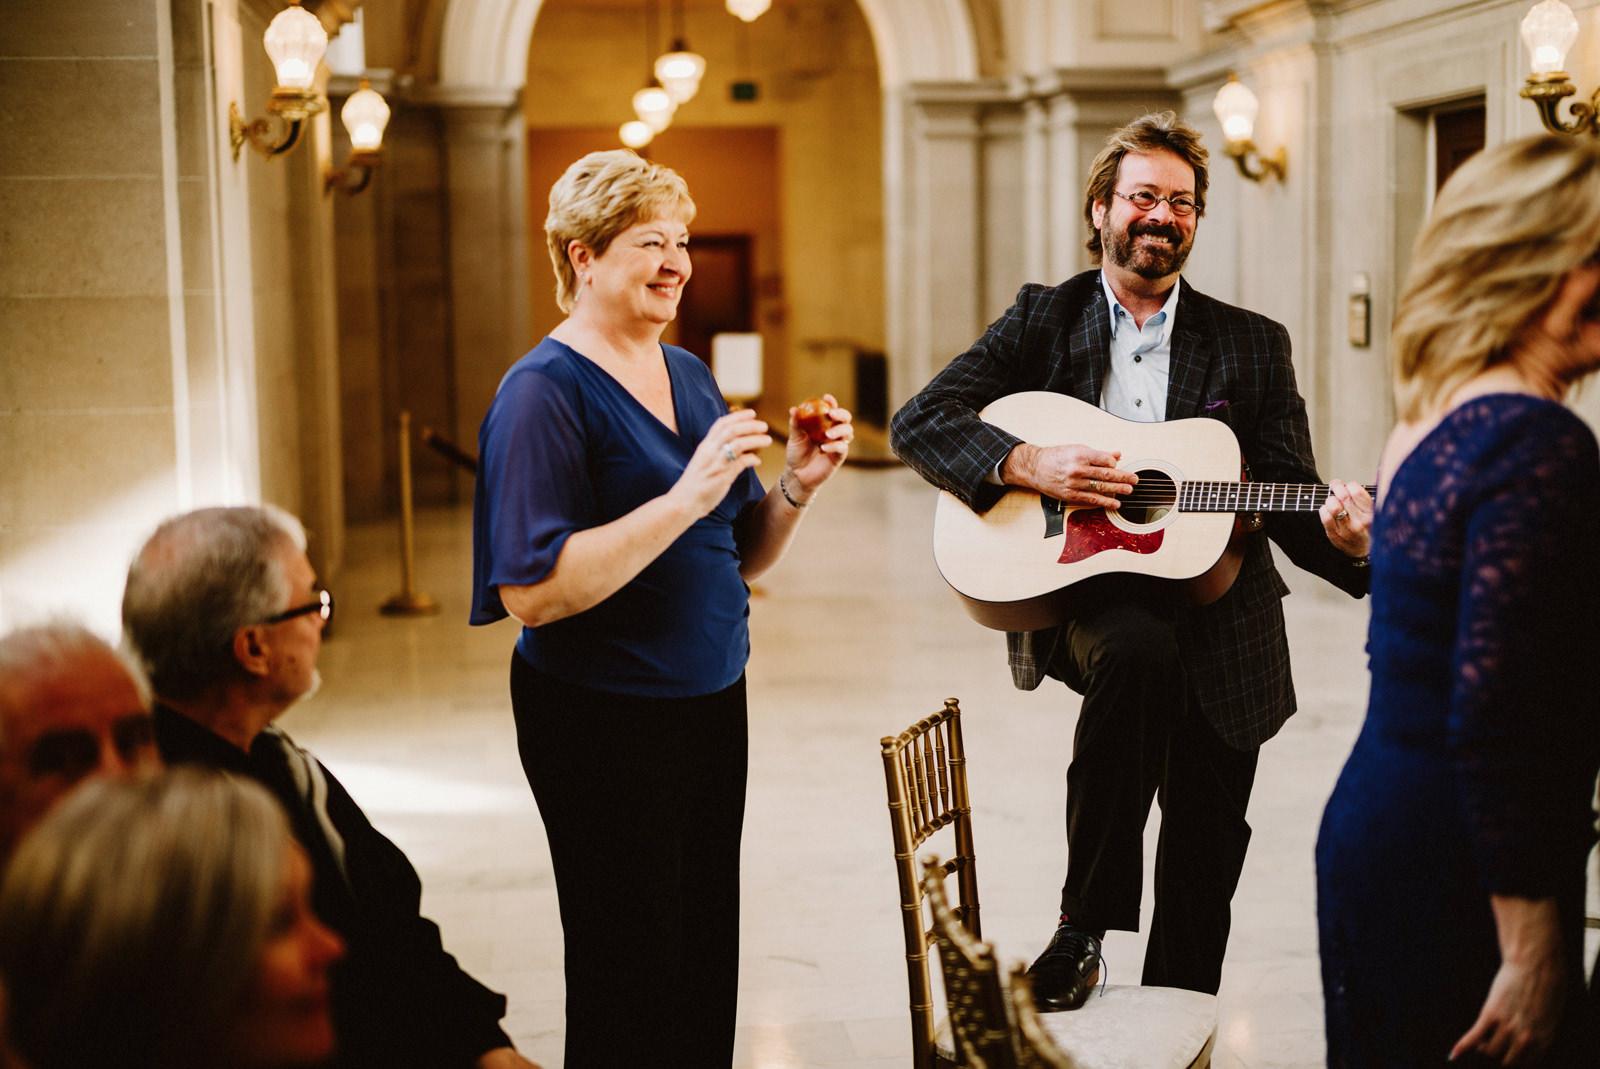 san-francisco-city-hall-elopement-28 SAN FRANCISCO CITY HALL INTIMATE WEDDING